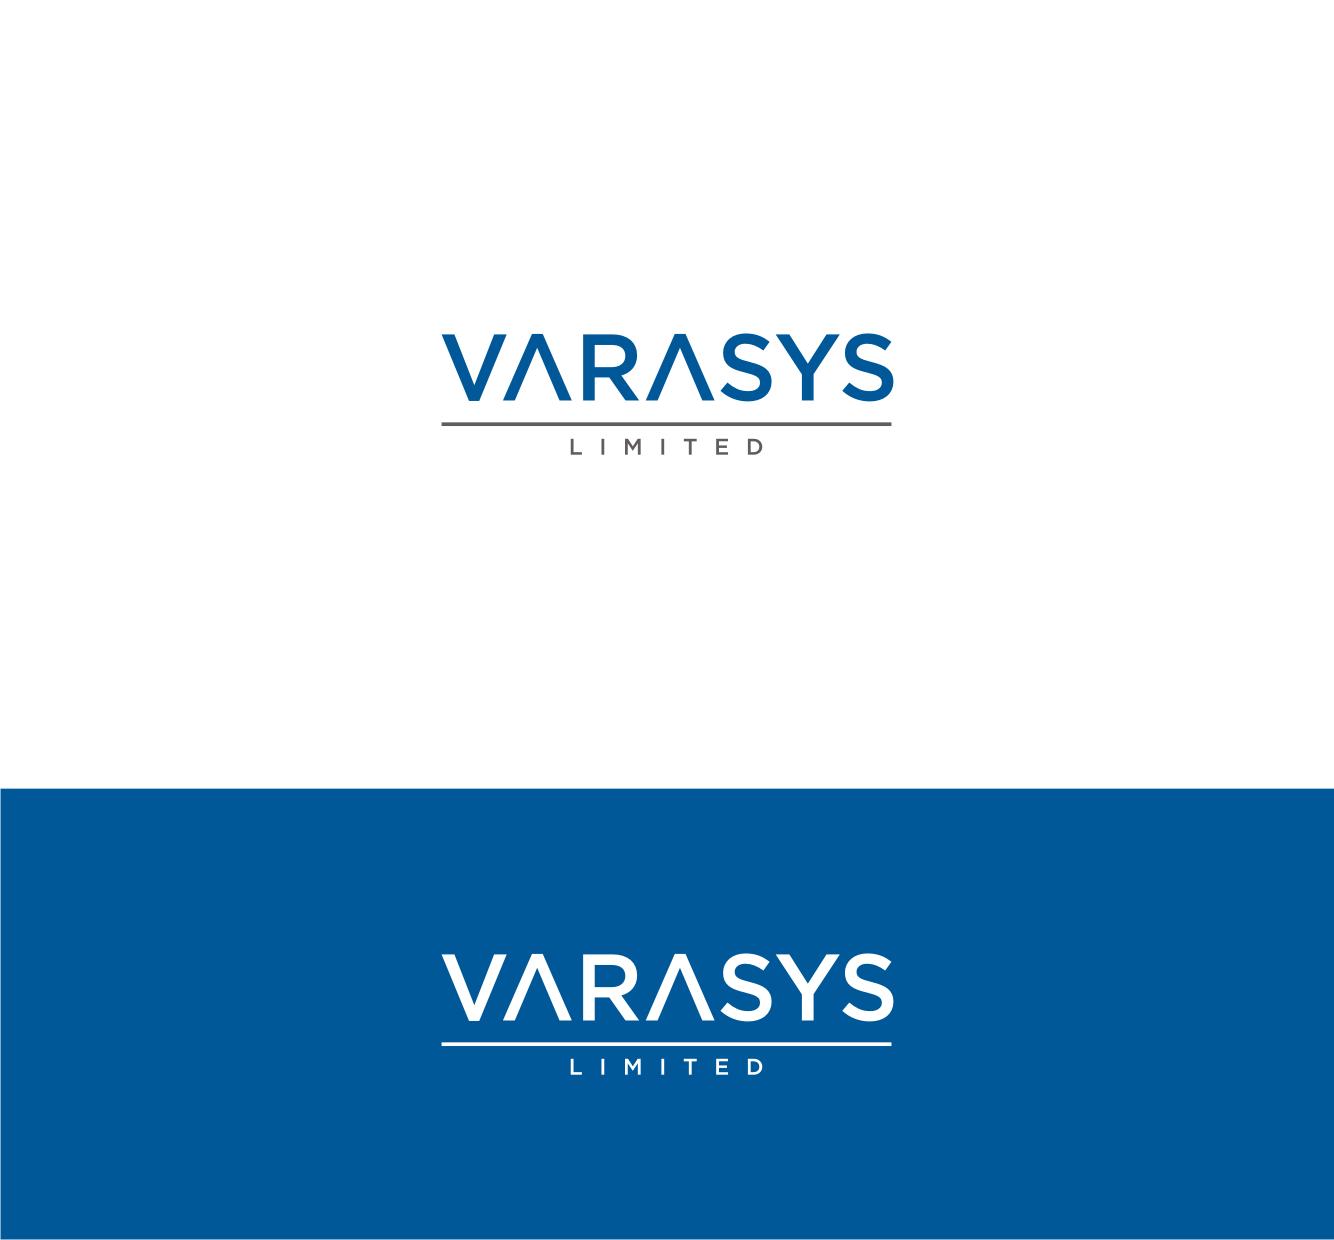 Logo Design by Sigitumarali Sigit - Entry No. 2 in the Logo Design Contest Artistic Logo Design for VARASYS Limited.